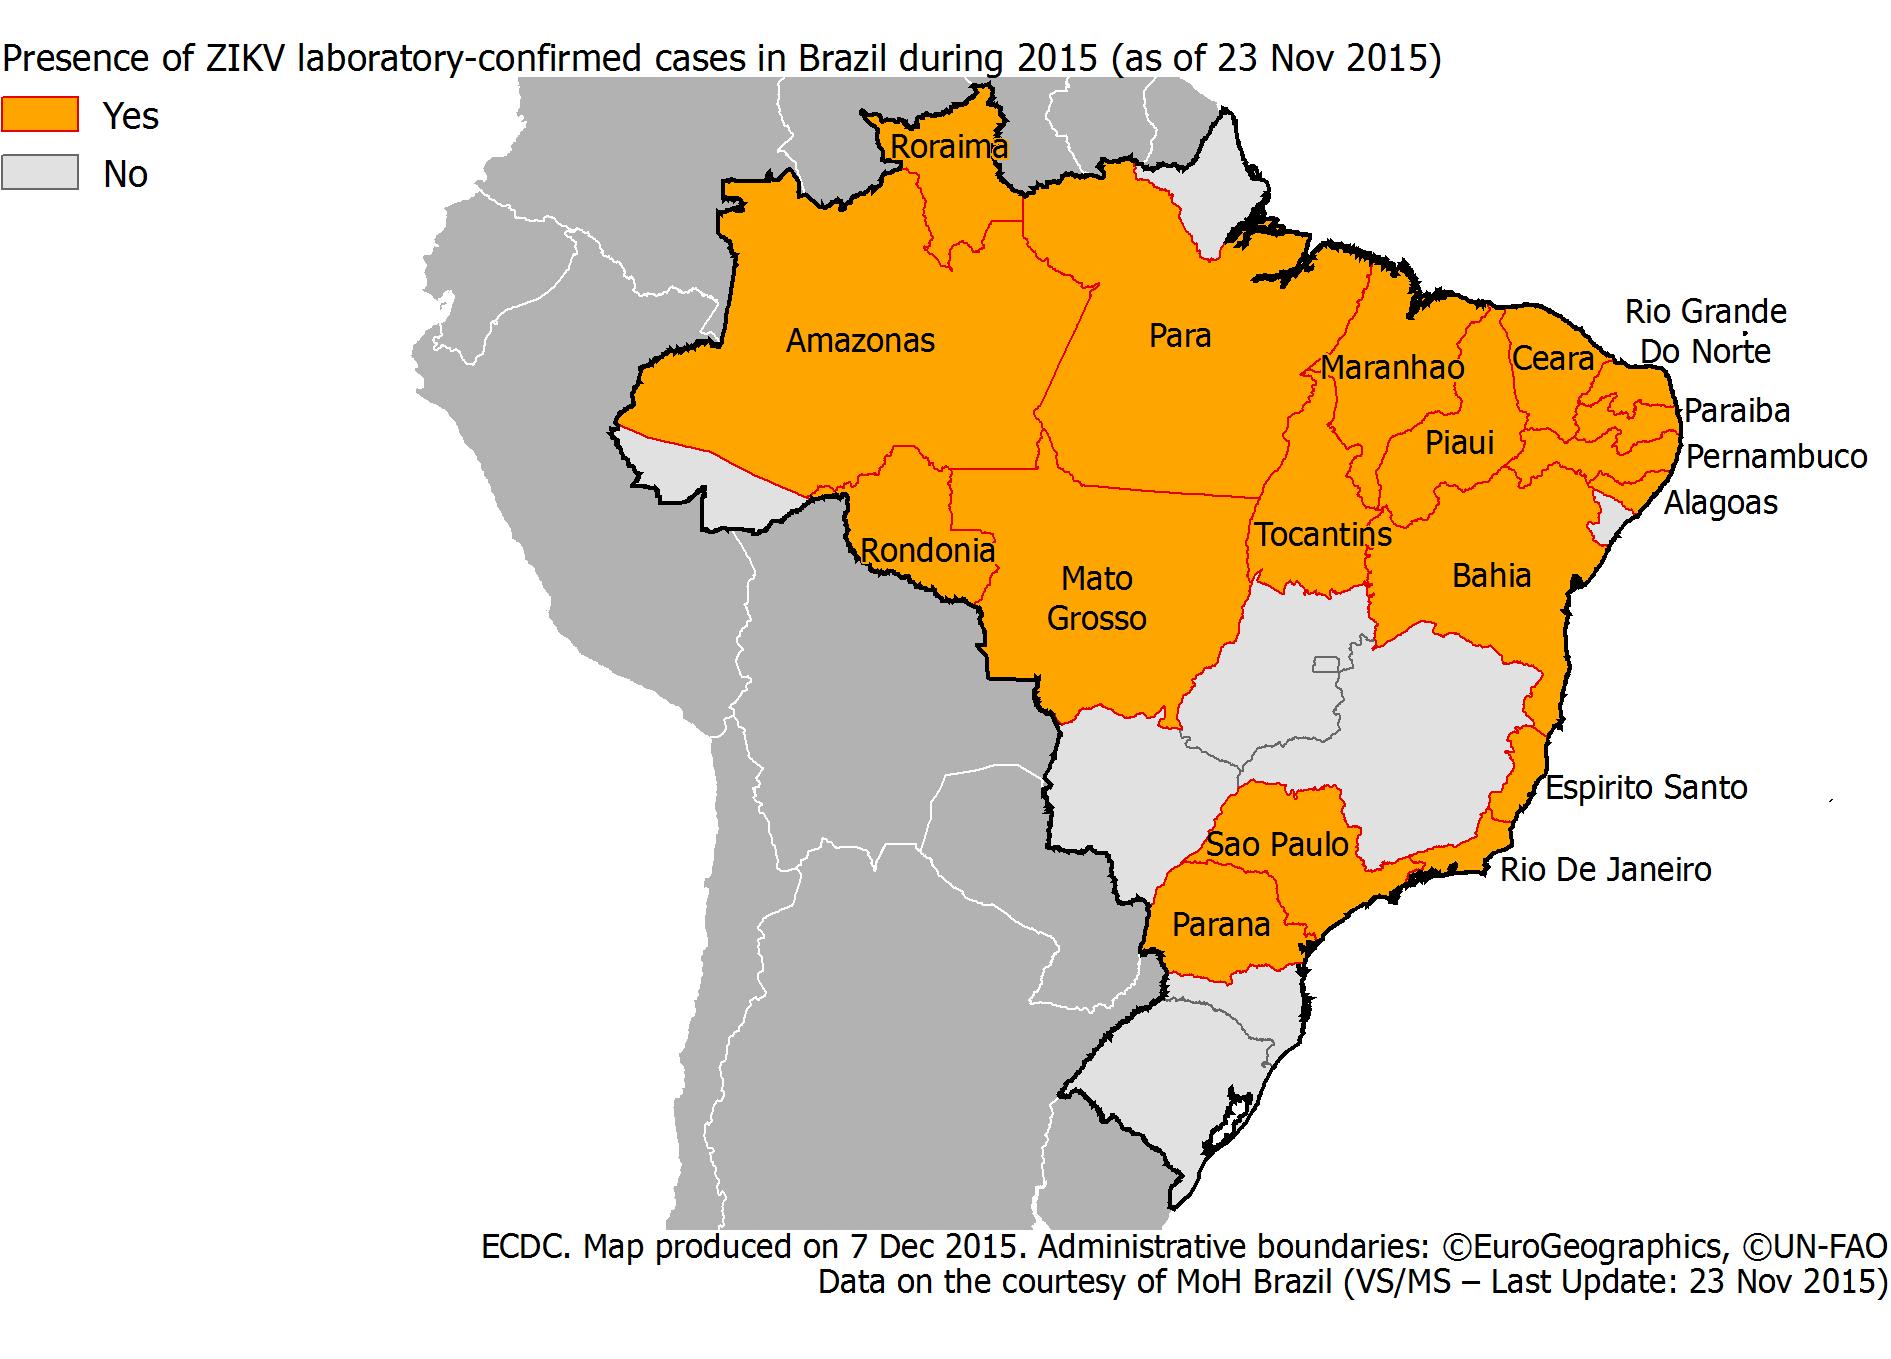 states-lab-confirmed-zika-cases-brazil-nov-2015-1